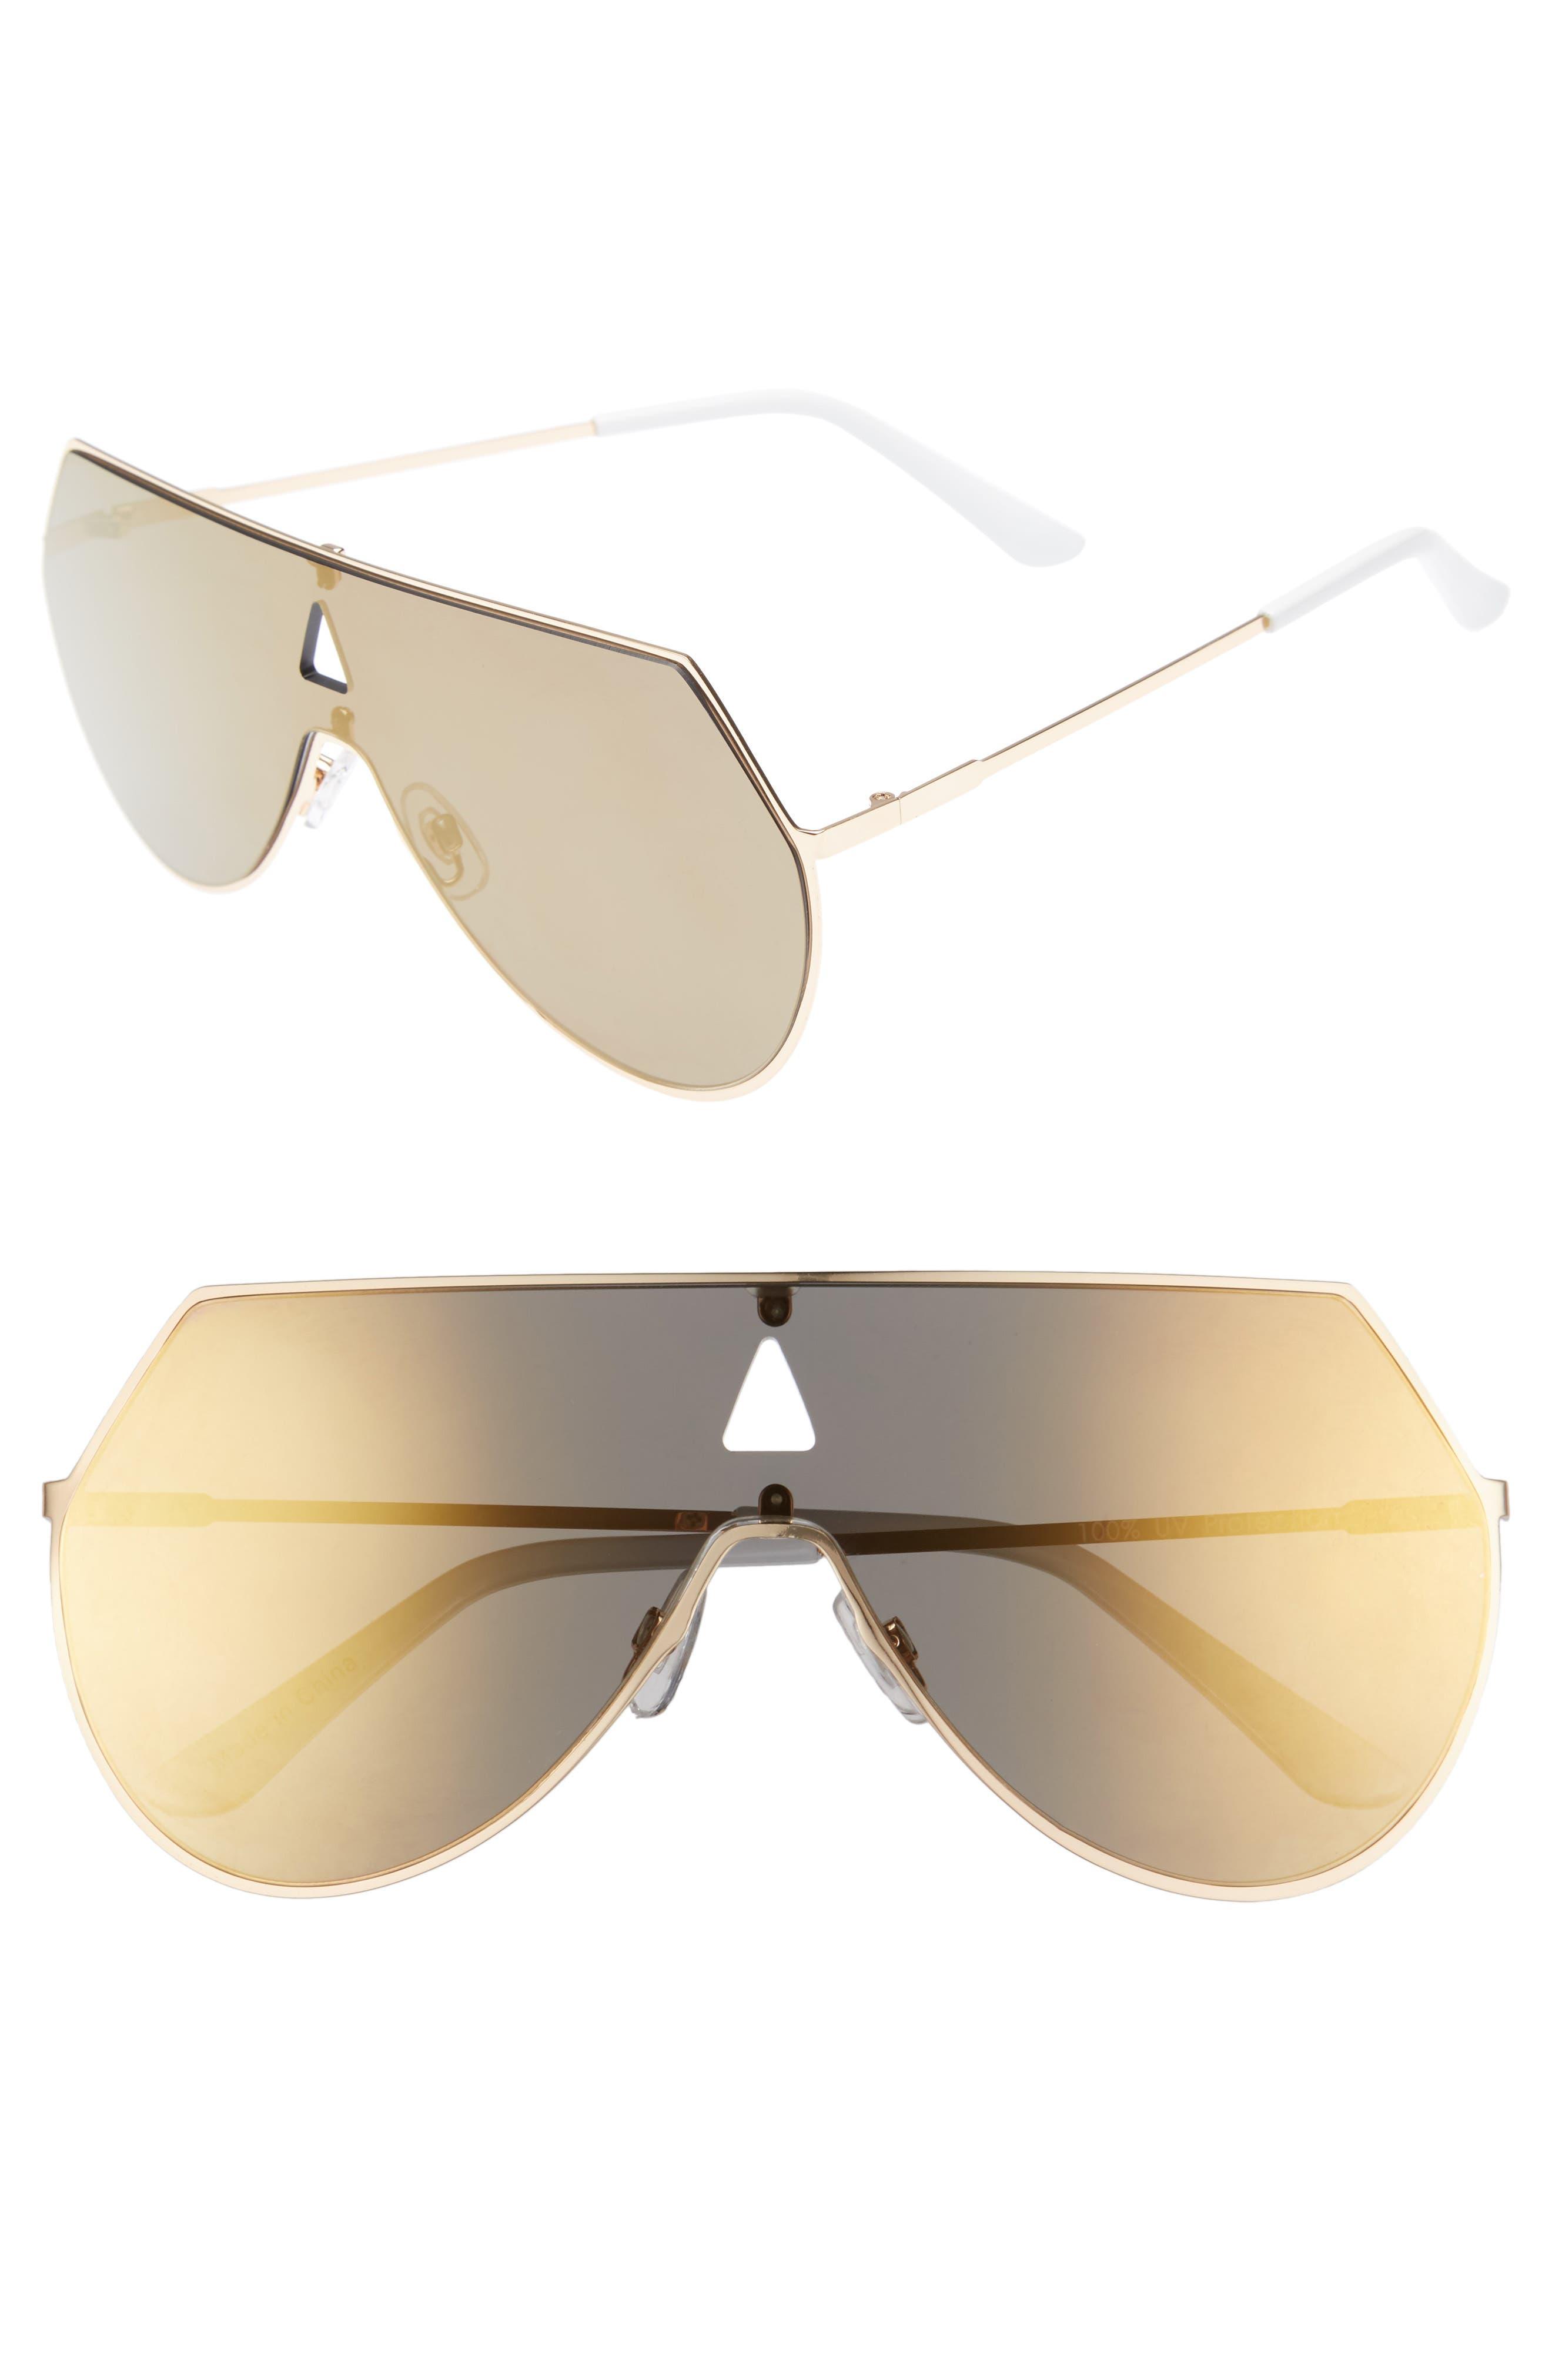 Alternate Image 1 Selected - BP. 60mm Flat Lens Aviator Sunglasses